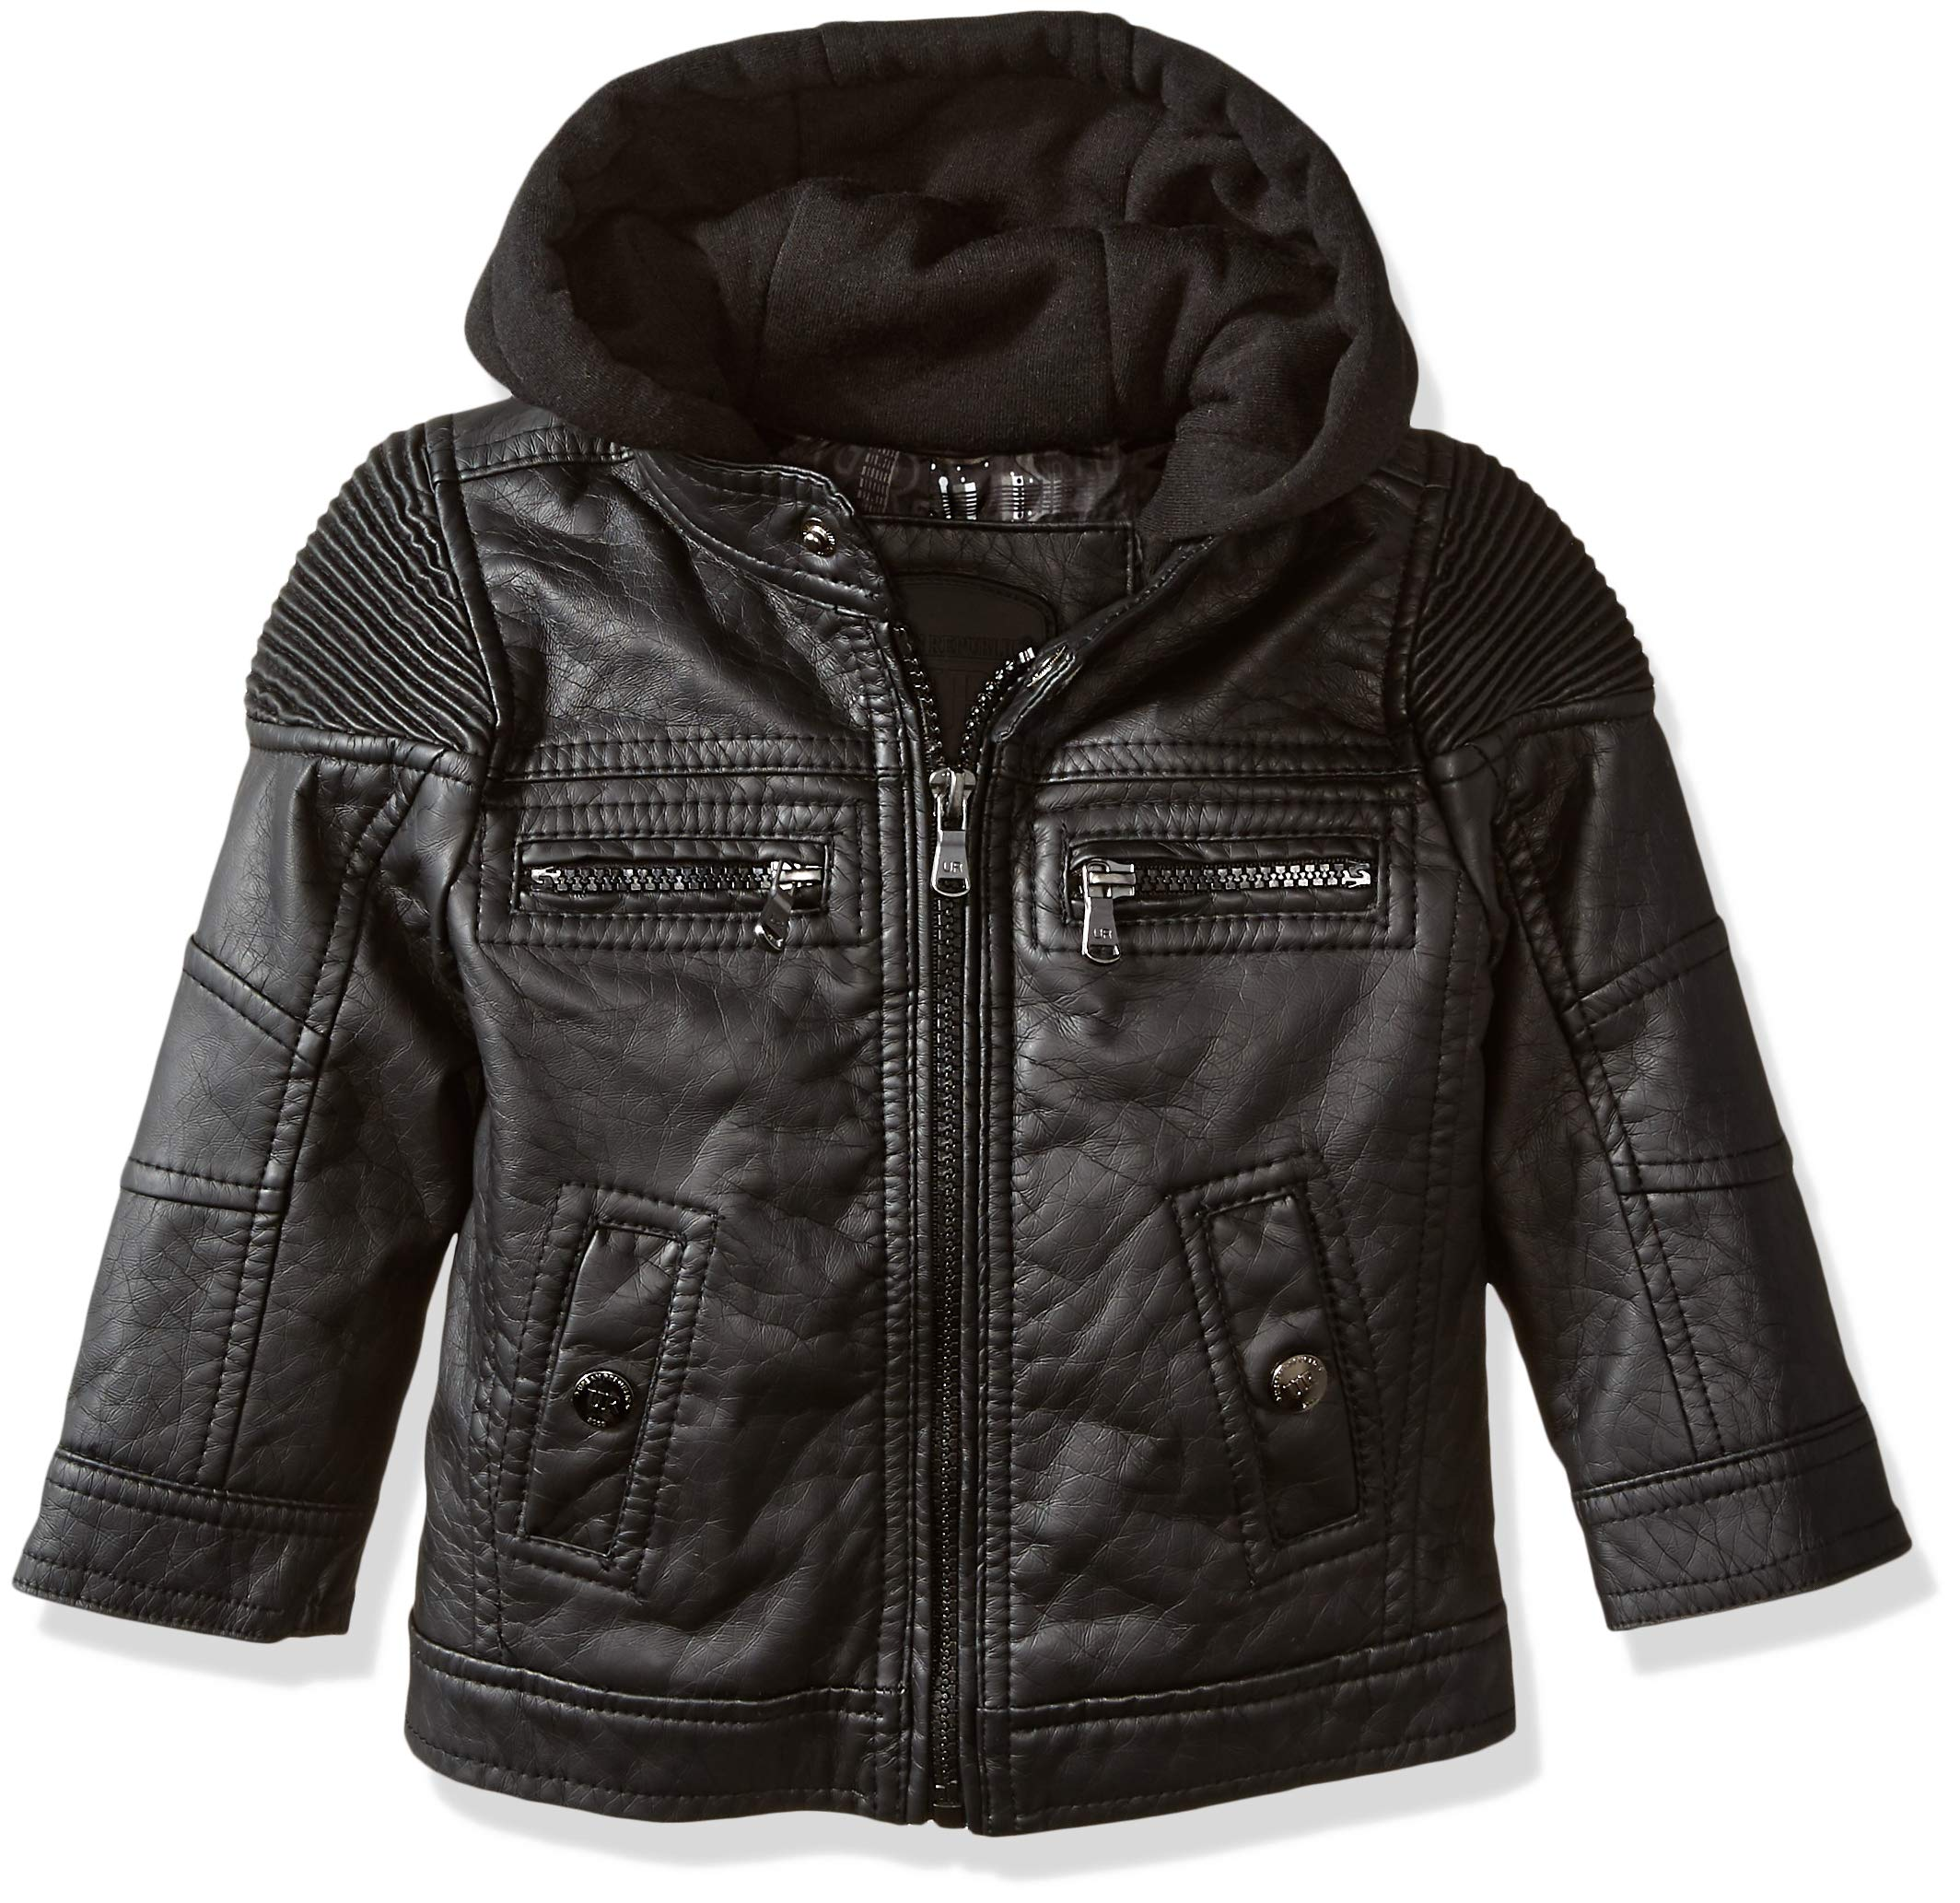 cbce464000b5 Galleon - Urban Republic Baby Ur Boys Faux Leather Jacket